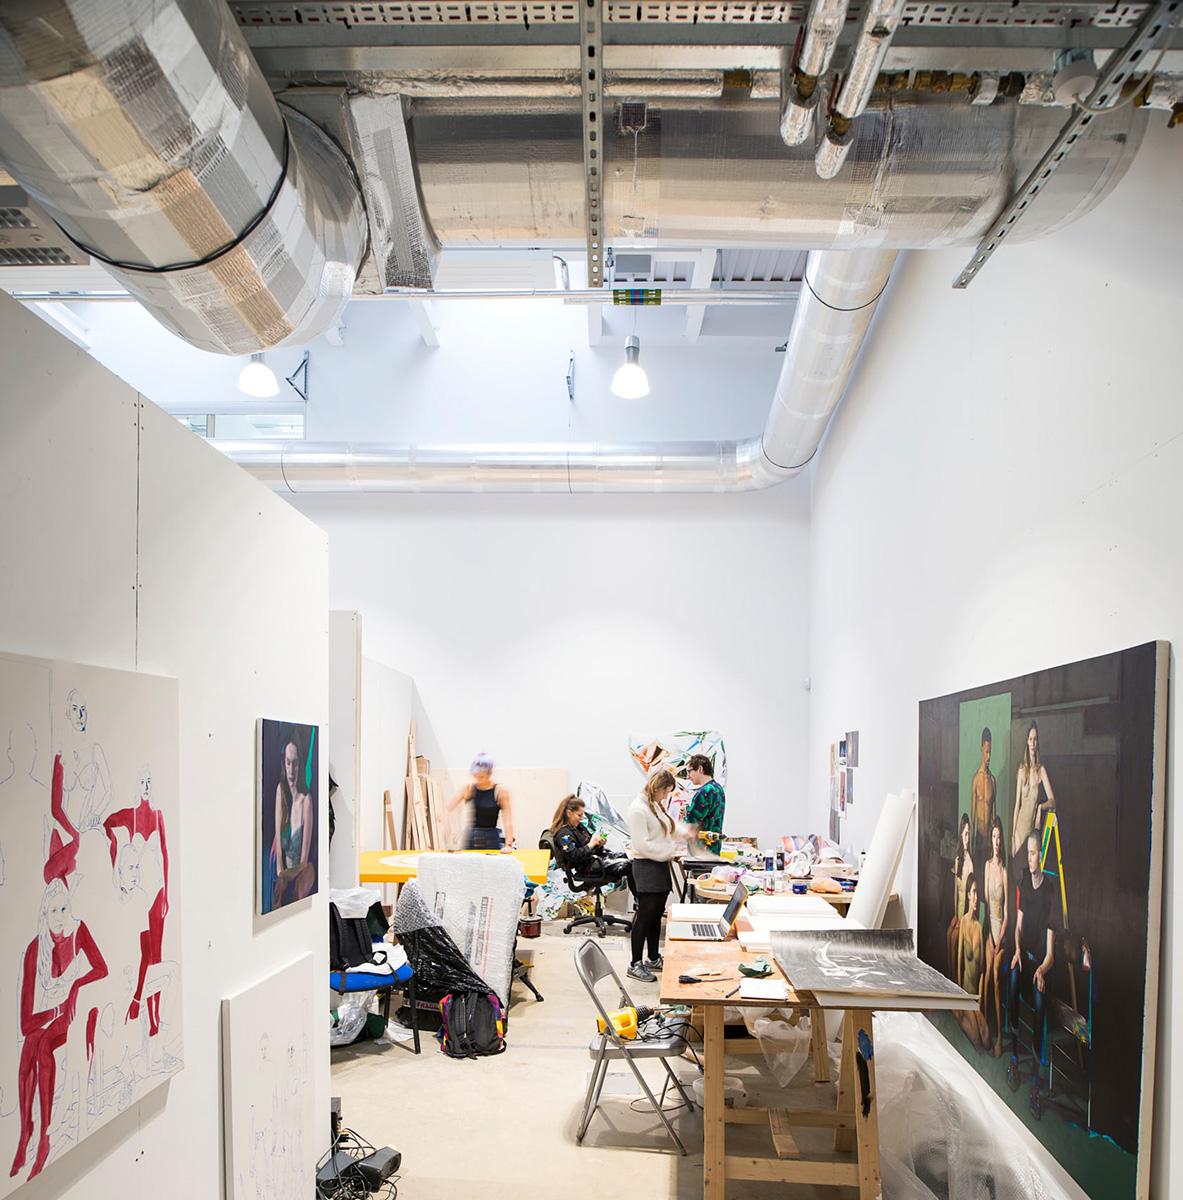 05-the-ruskin-school-of-art-spratley-studios